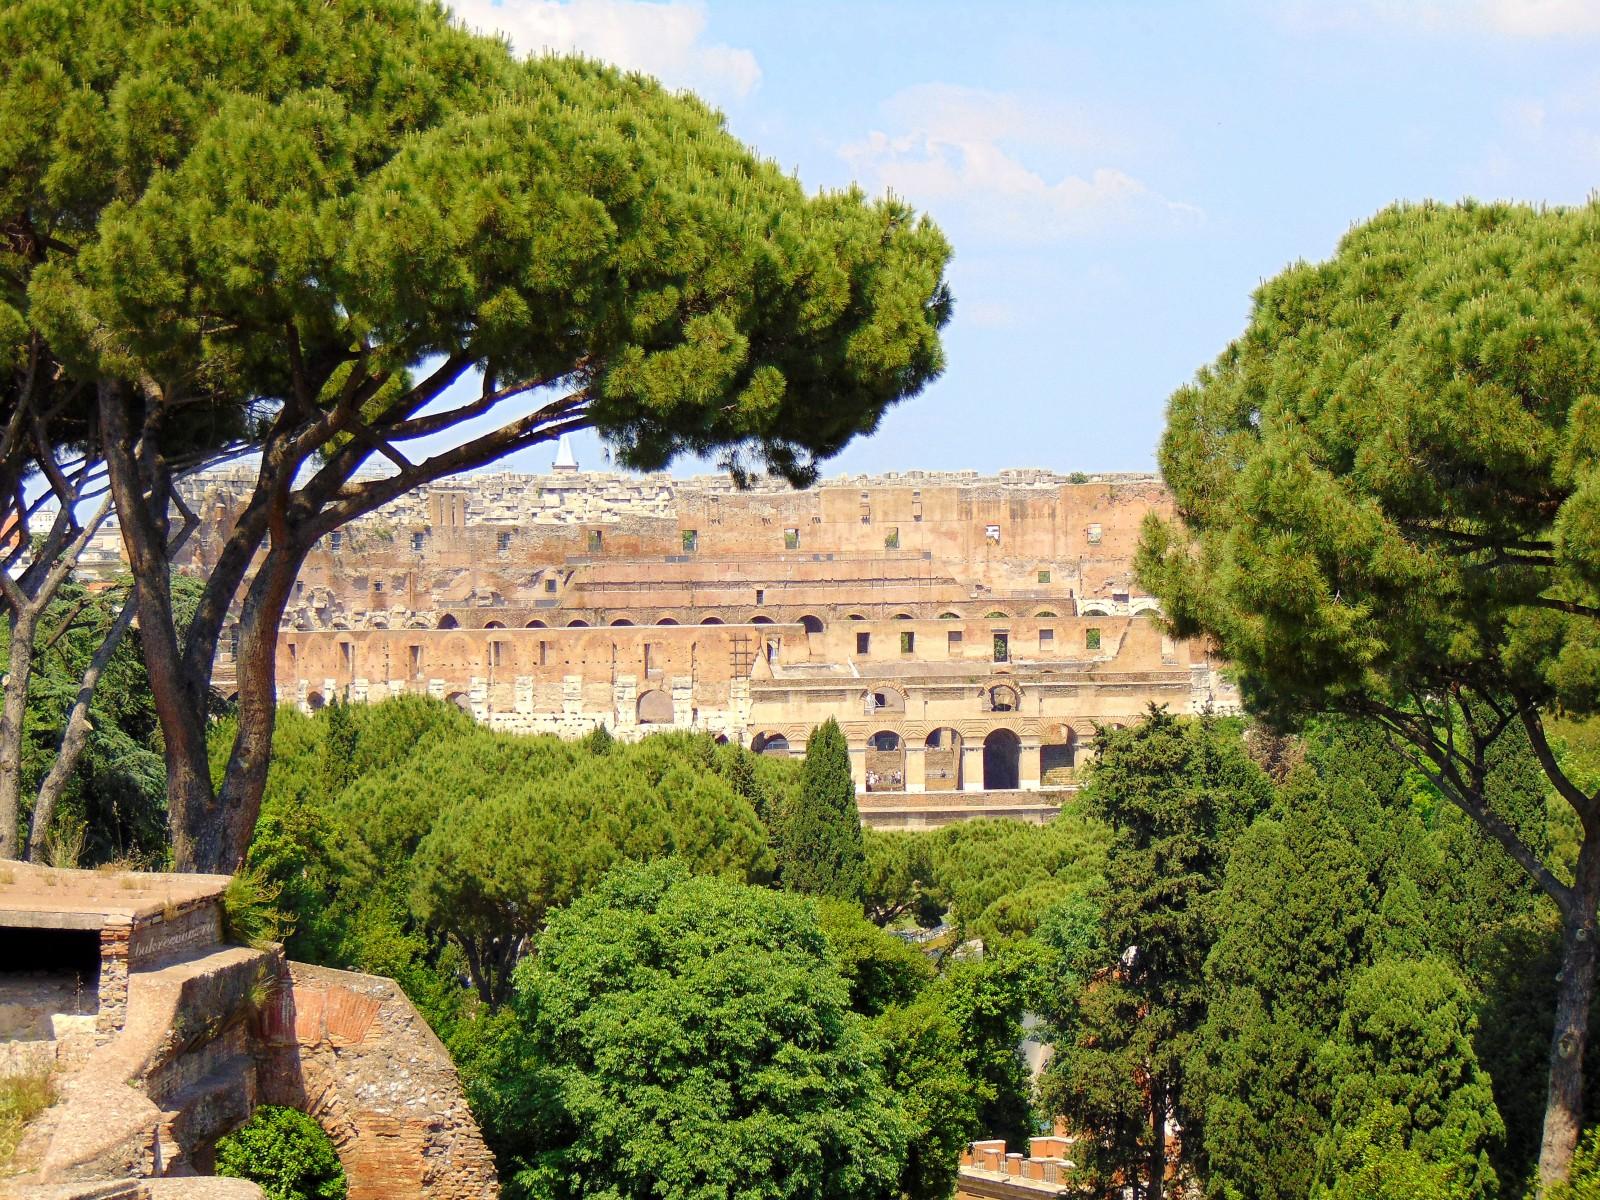 Colosseo48